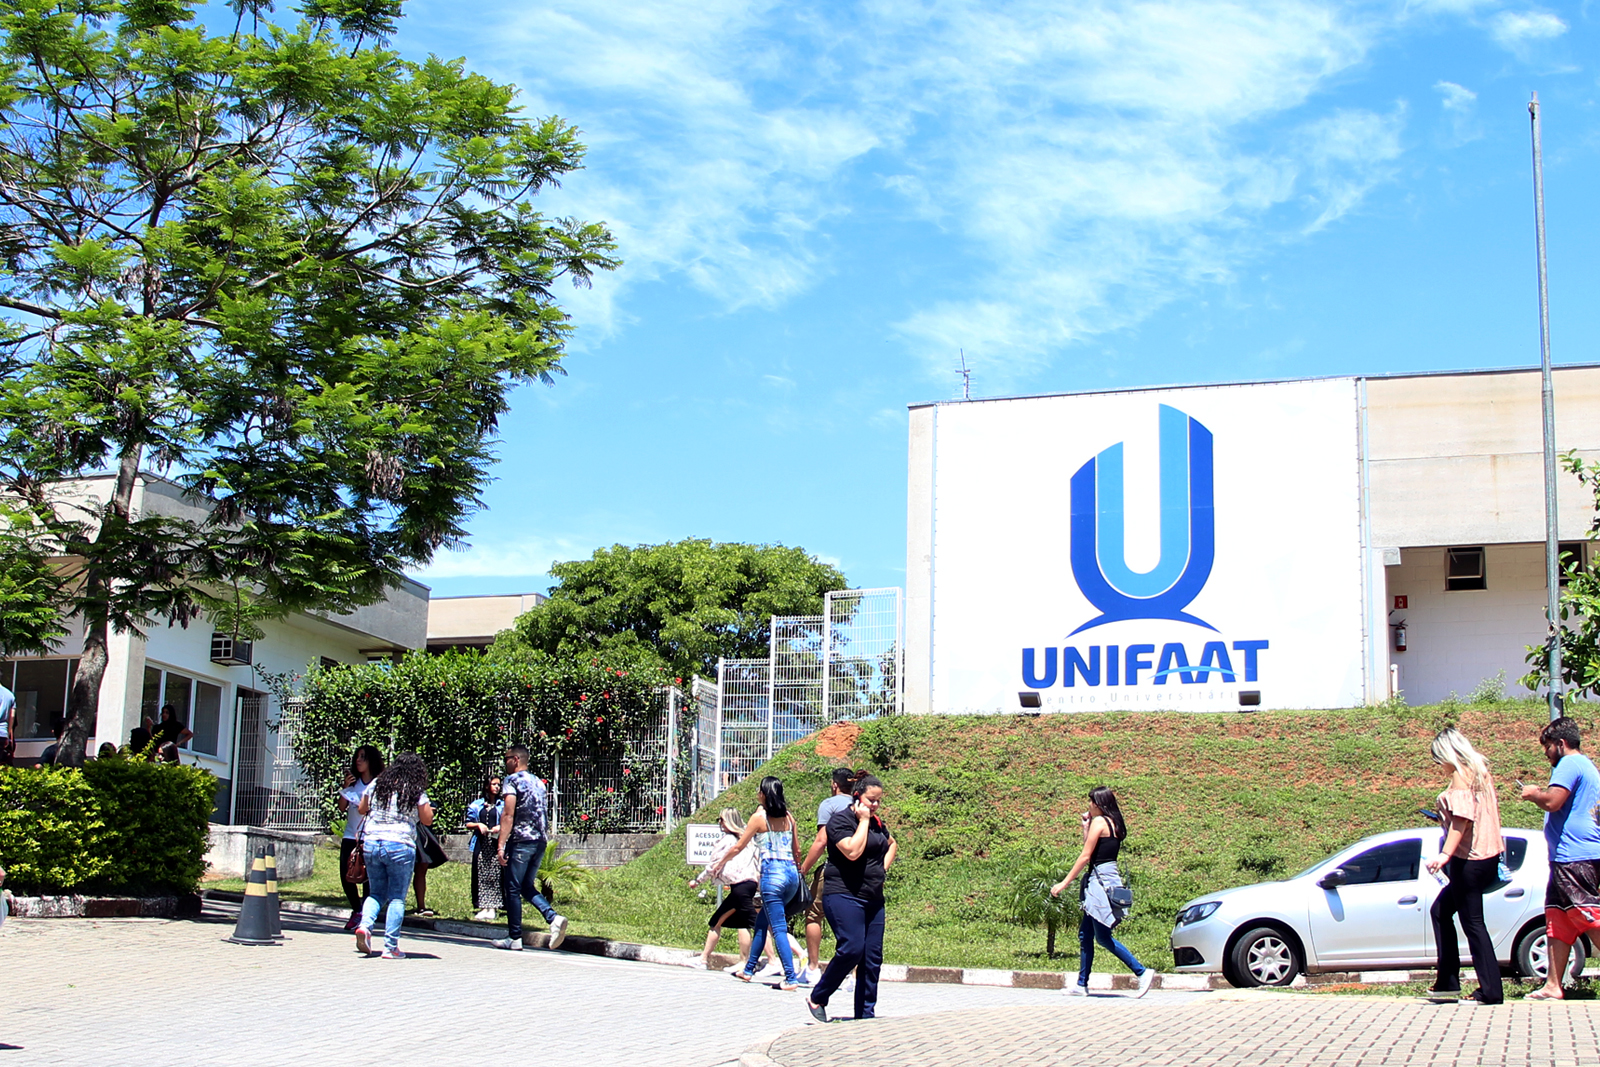 UNIFAAT